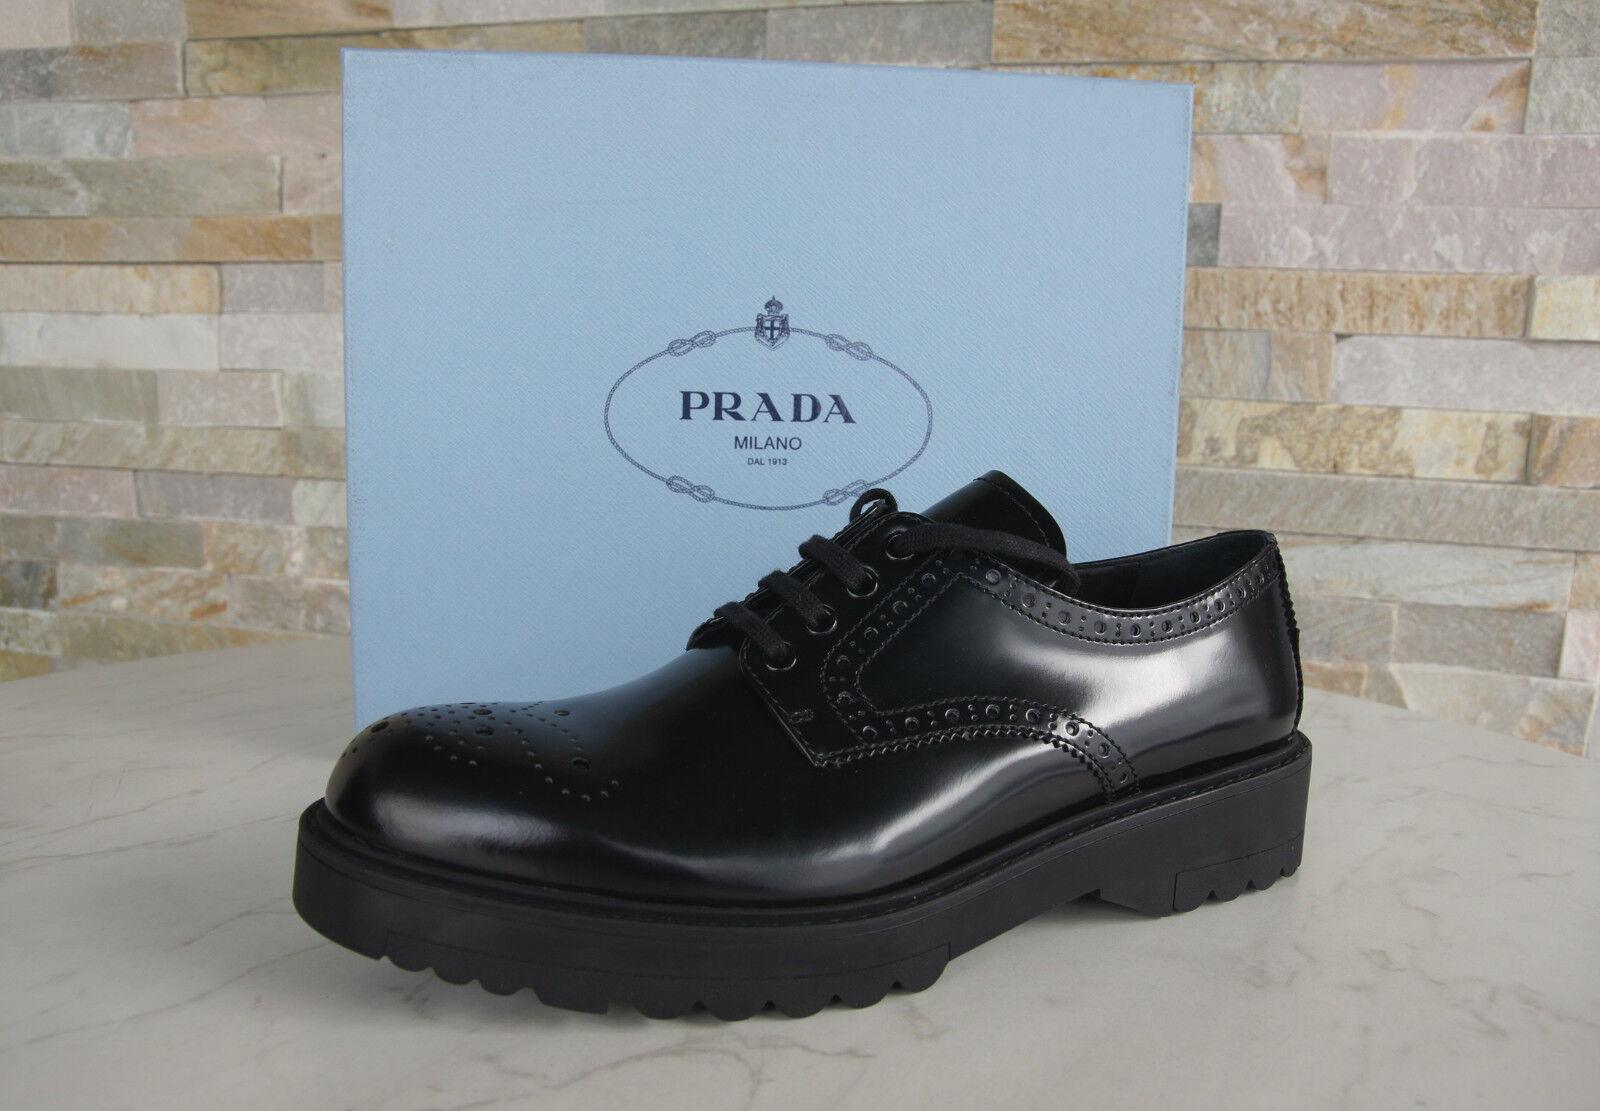 PRADA TAGLIA 41   Basse Budapester normalissime normalissime normalissime scarpe nero nuovo ex UVP 1346be